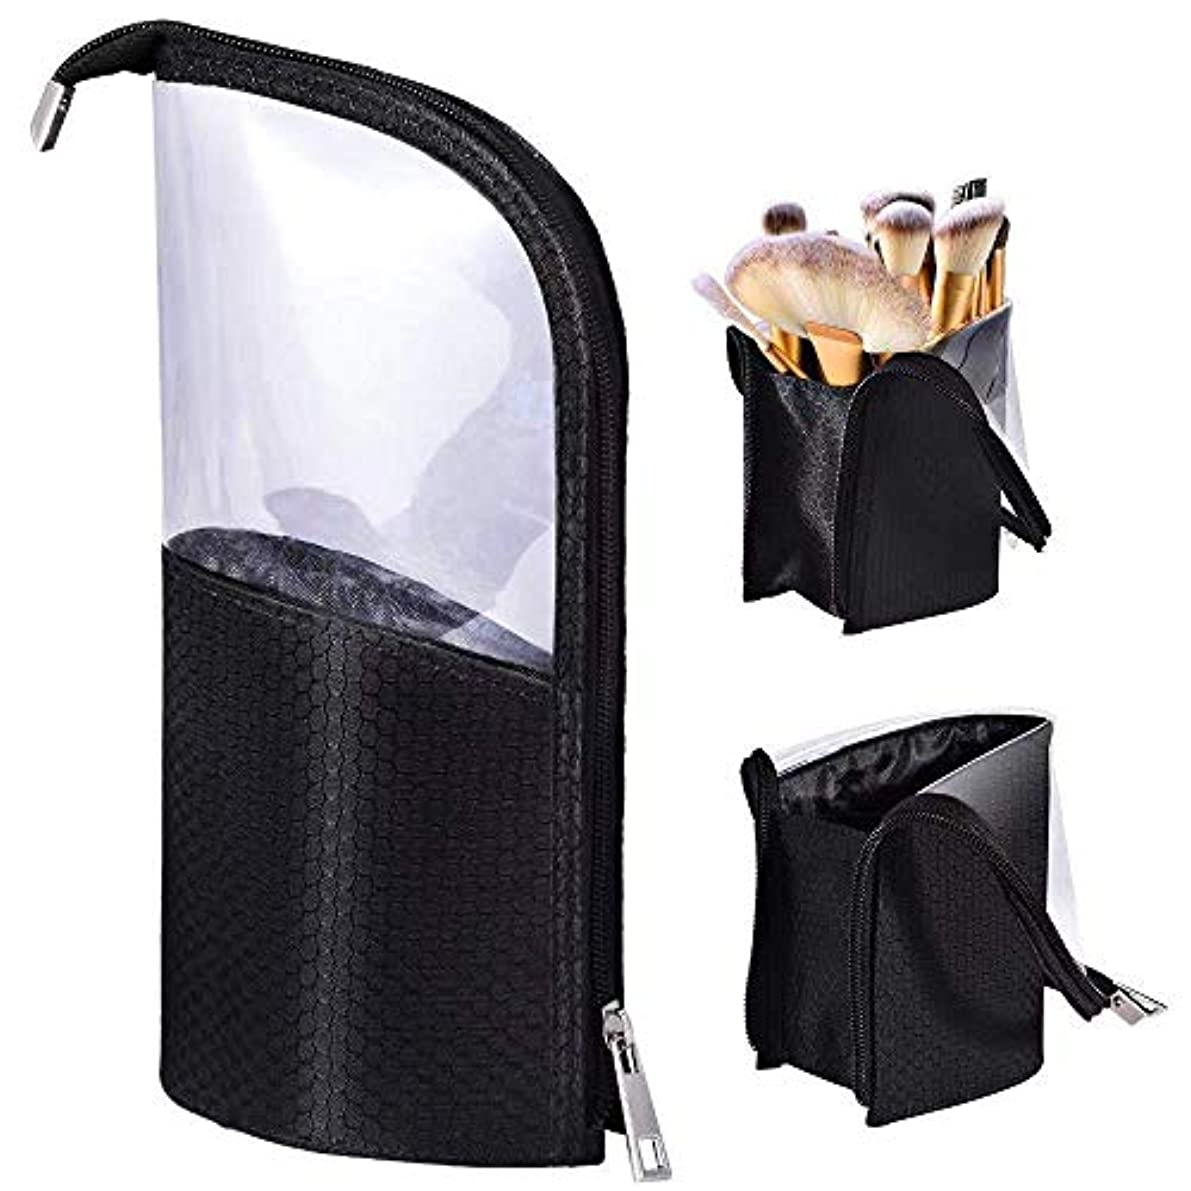 MOMO ペンケース 化粧筆ポーチ 化粧ポーチ 旅行収納 筆箱 小物入れ メイクブラシホルダー バッグ スタンド ケース 24本収納